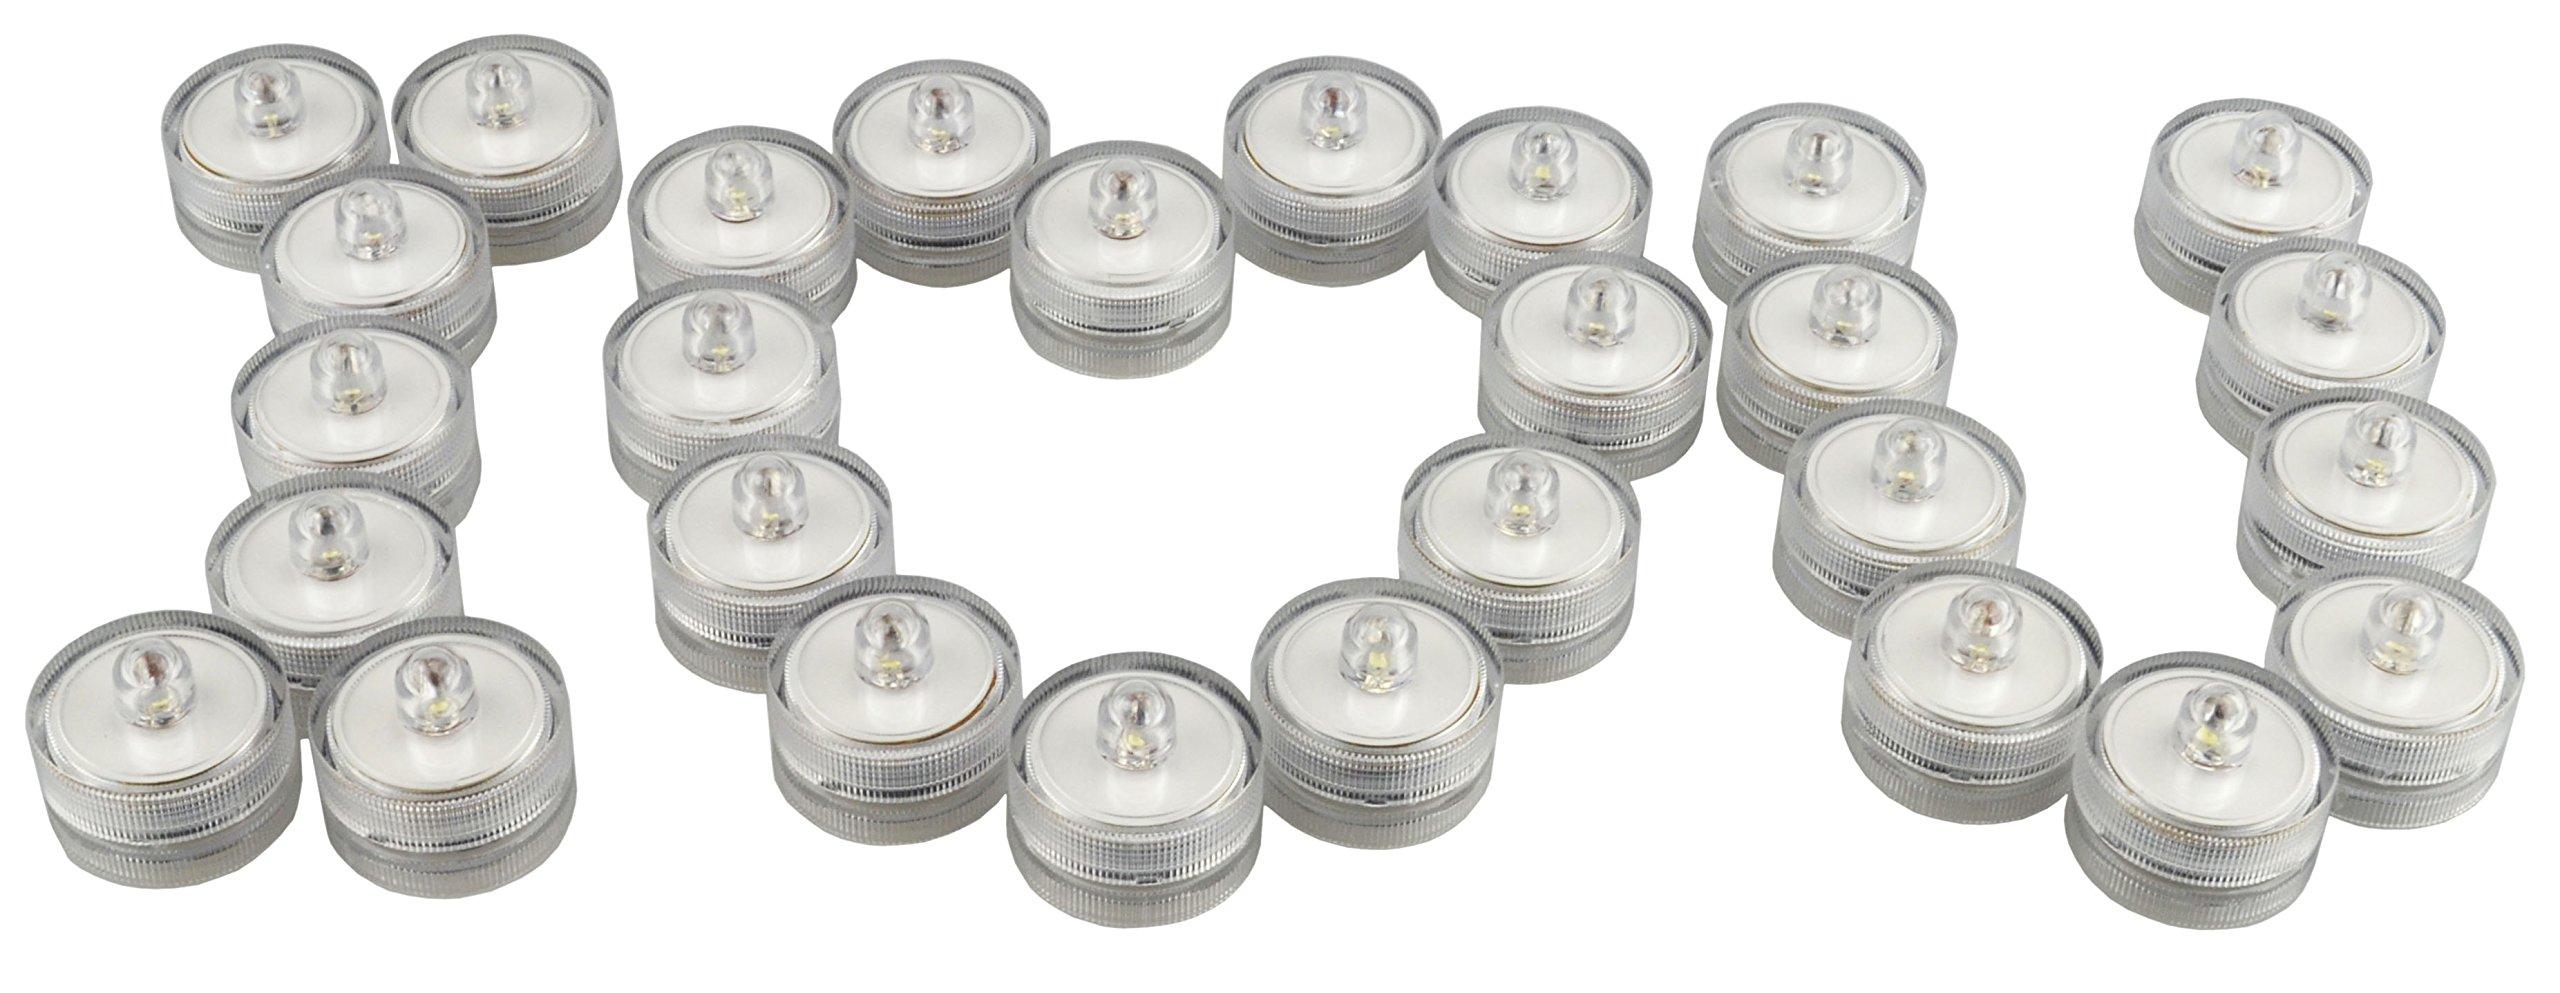 Samyo Set of 36 Waterproof Wedding Submersible Battery LED Tea Lights Underwater Sub Lights- Wedding Centerpieces Party Decorate (White) by Samyo (Image #8)